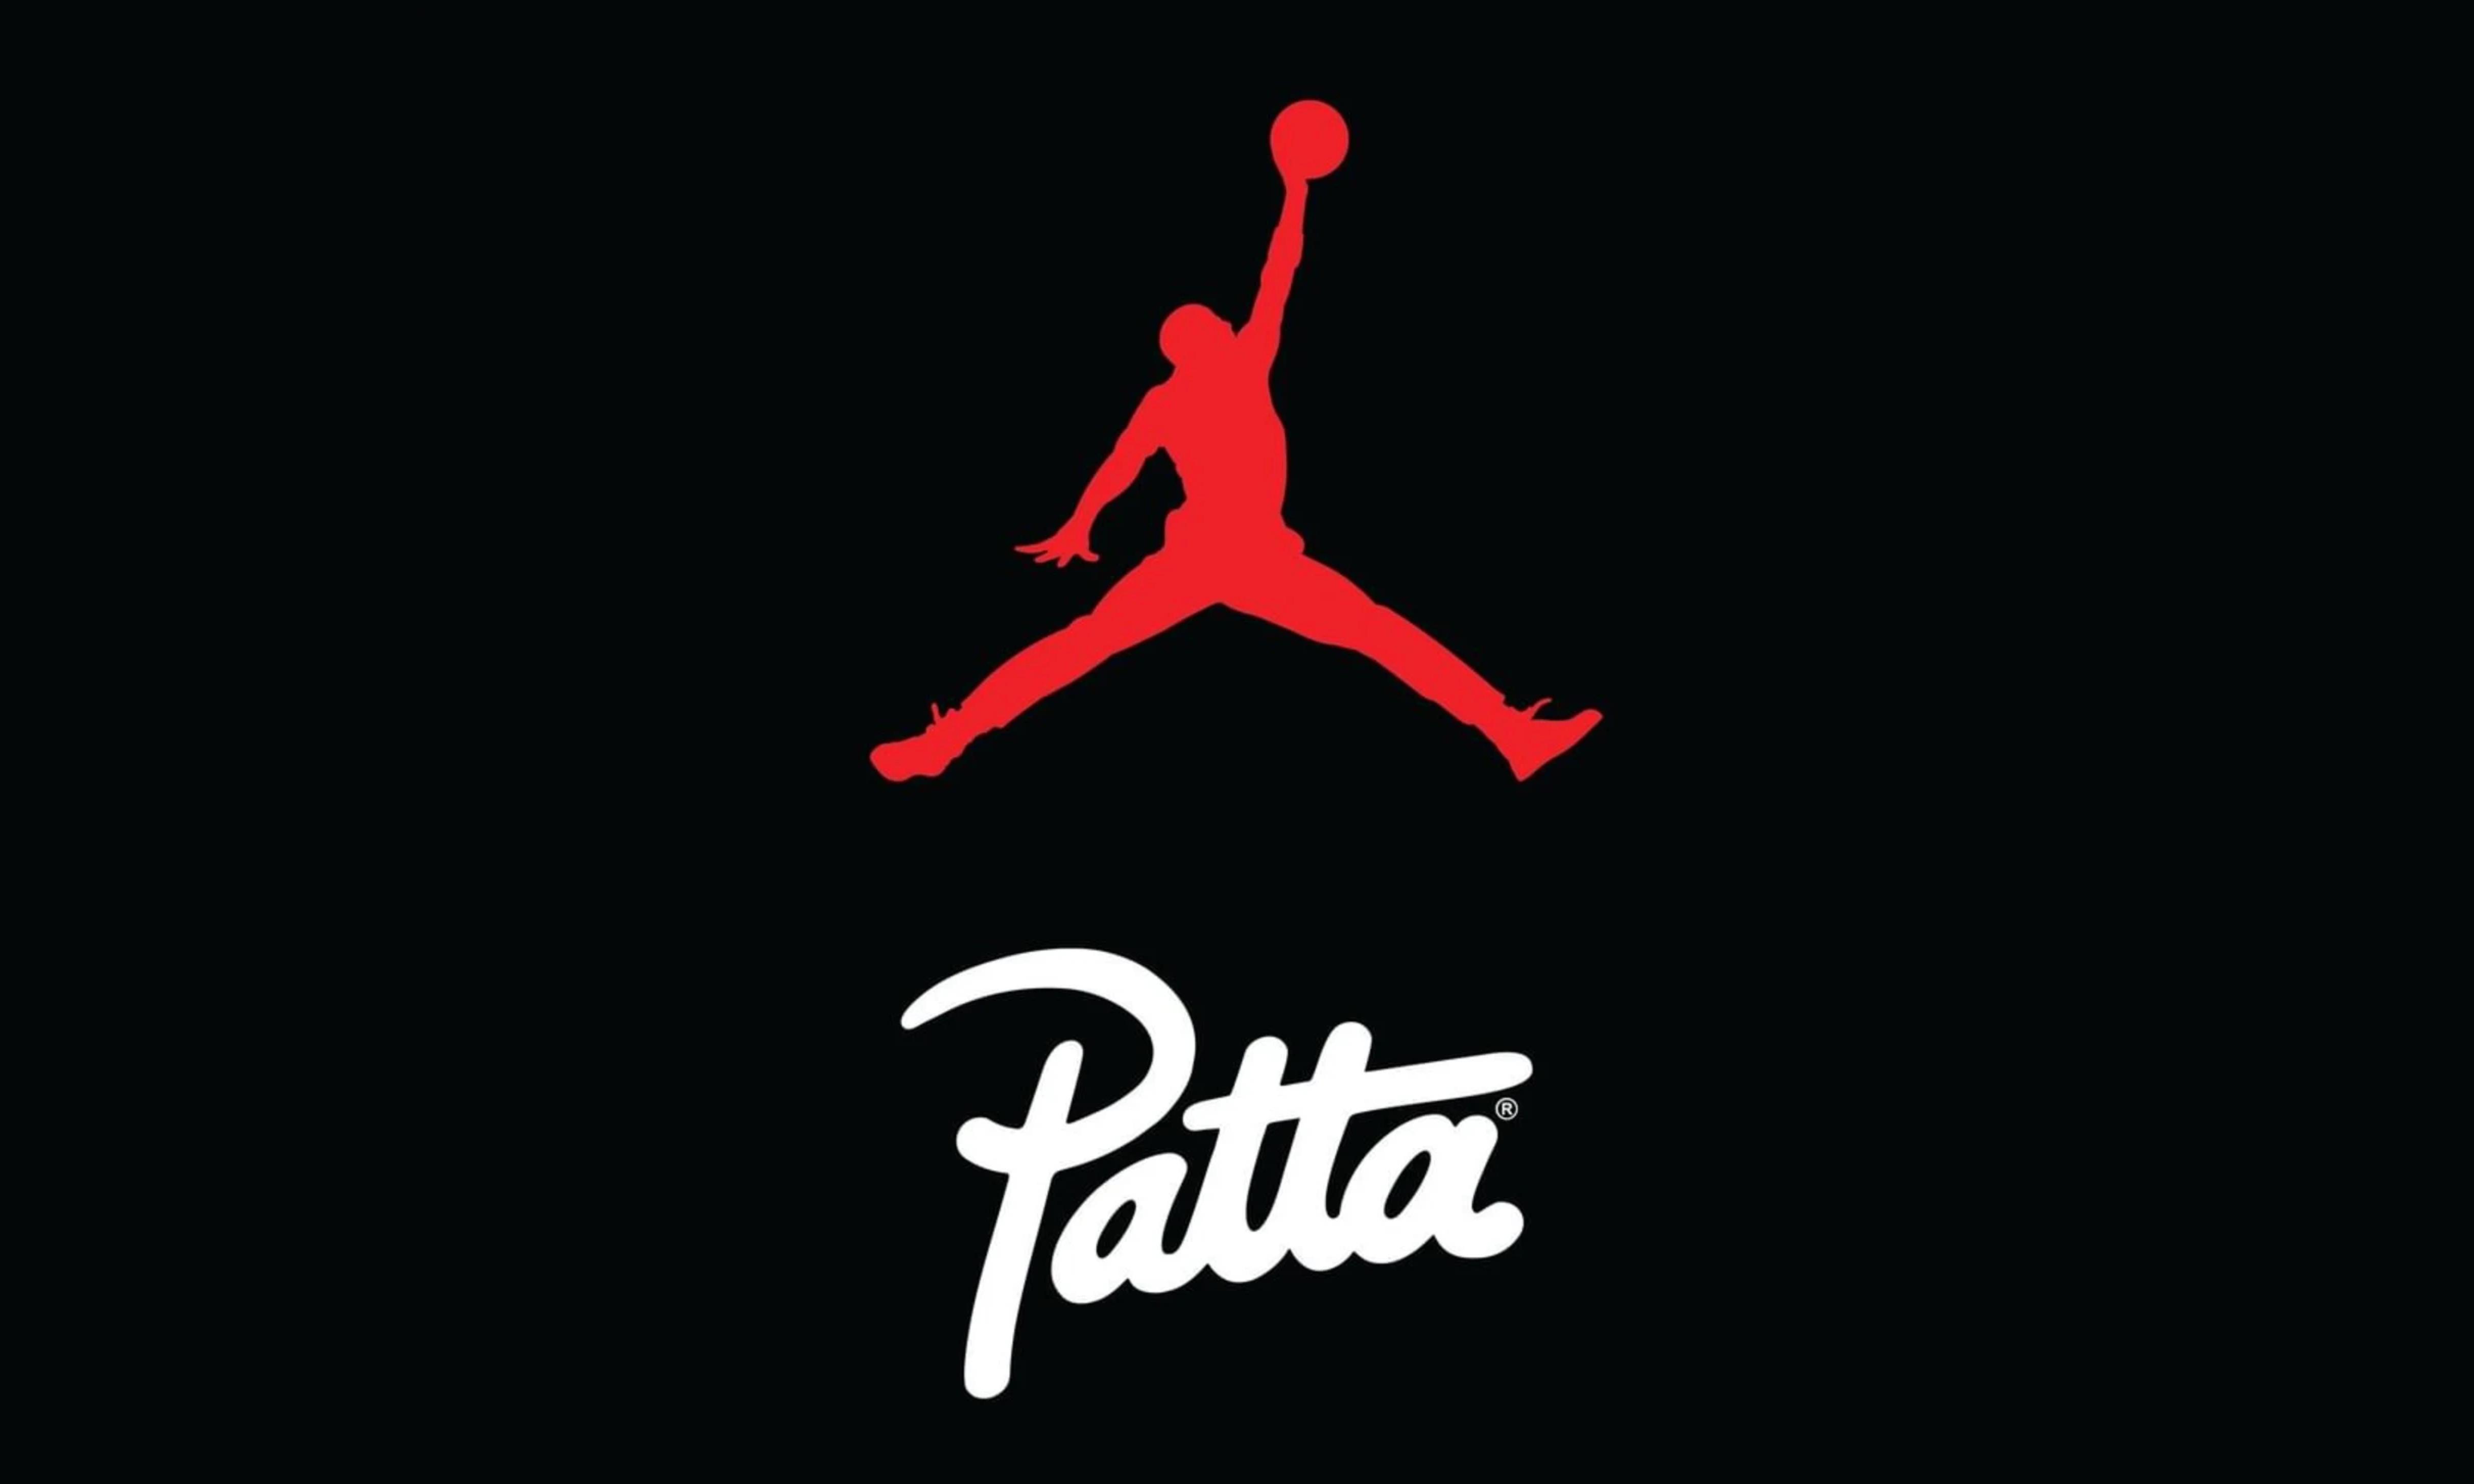 Patta 预告 Jordan Brand 联名新作即将揭晓